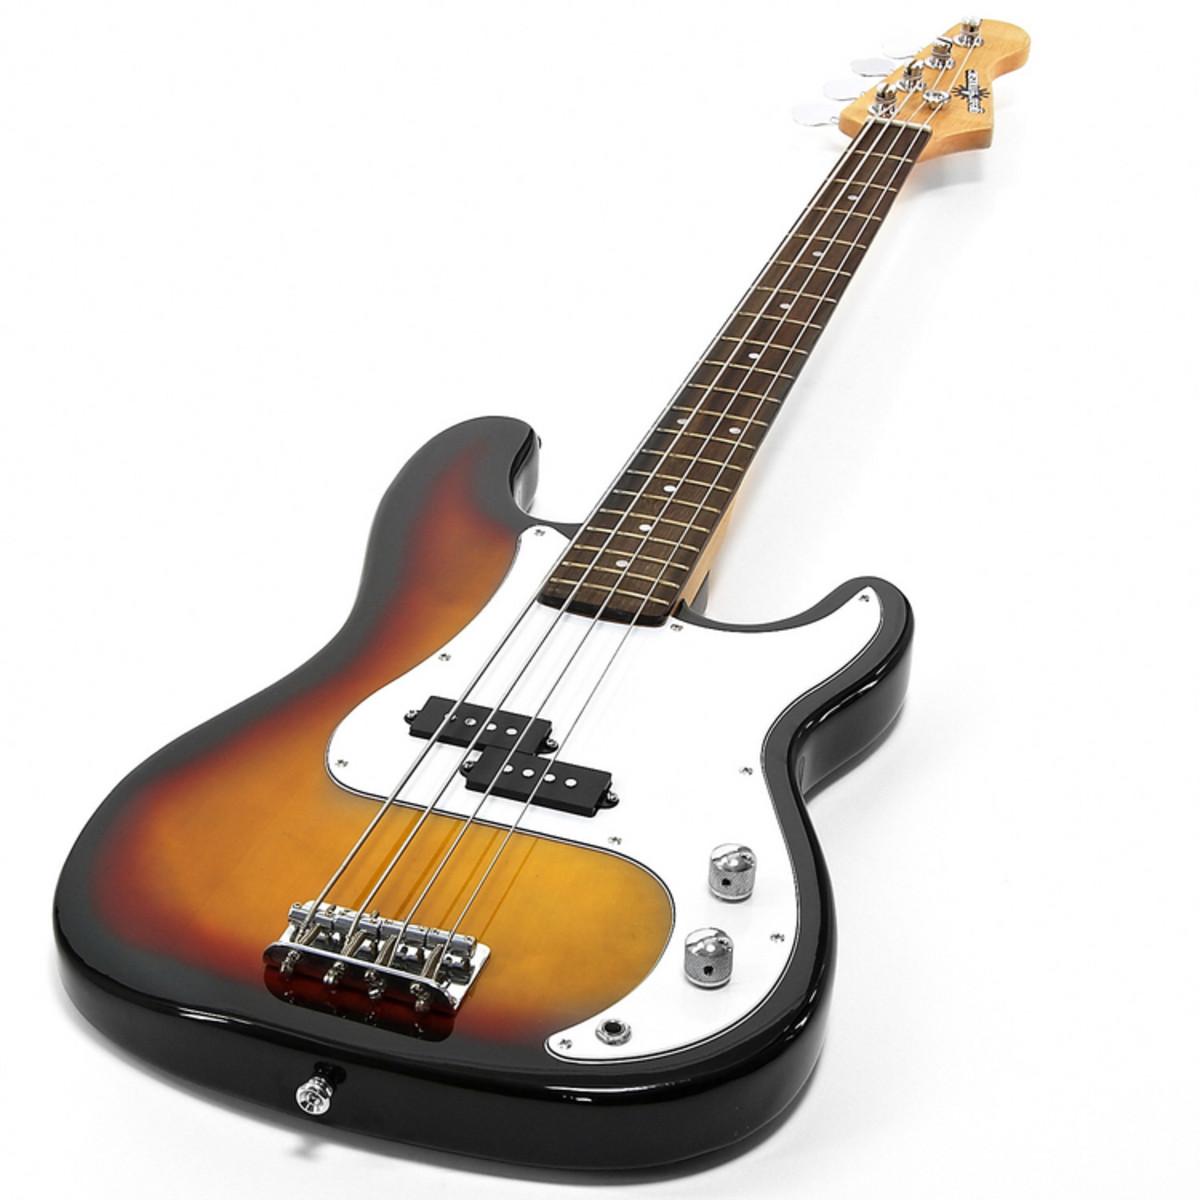 electric g 4 bass guitar sunburst christmas pack at gear4music. Black Bedroom Furniture Sets. Home Design Ideas